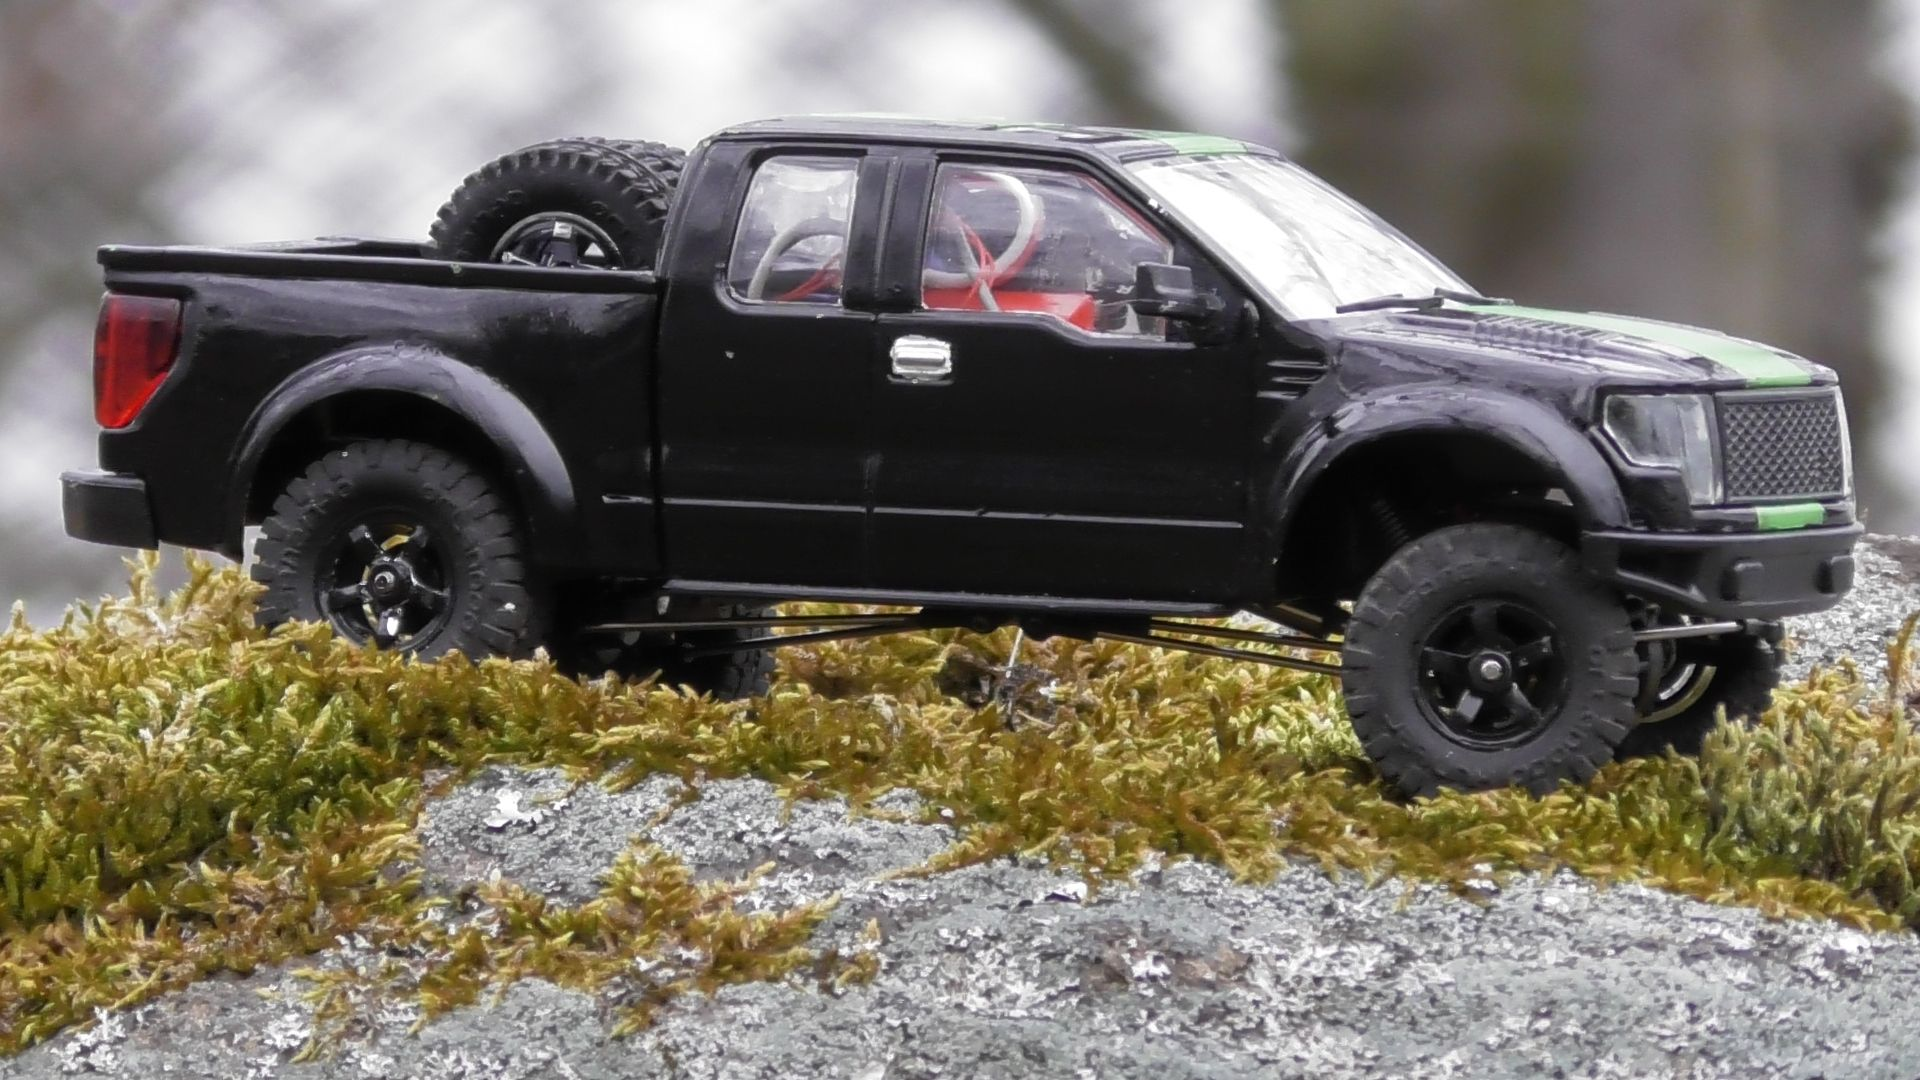 Orlandoo hunter oh35p01 1 35 rc truck ford f150 rc orlandoo orlandoohunter